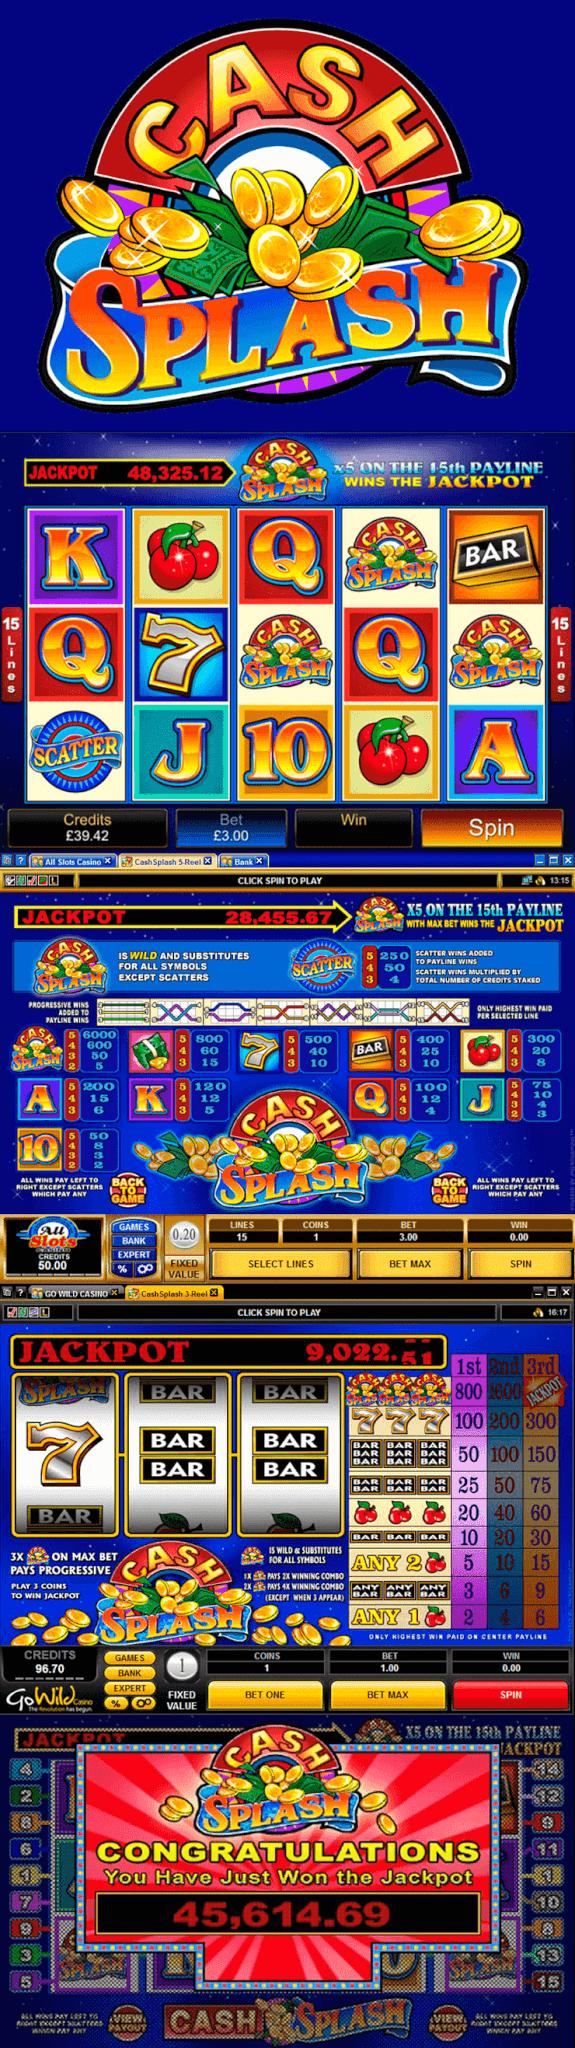 cash_splash_screen-min